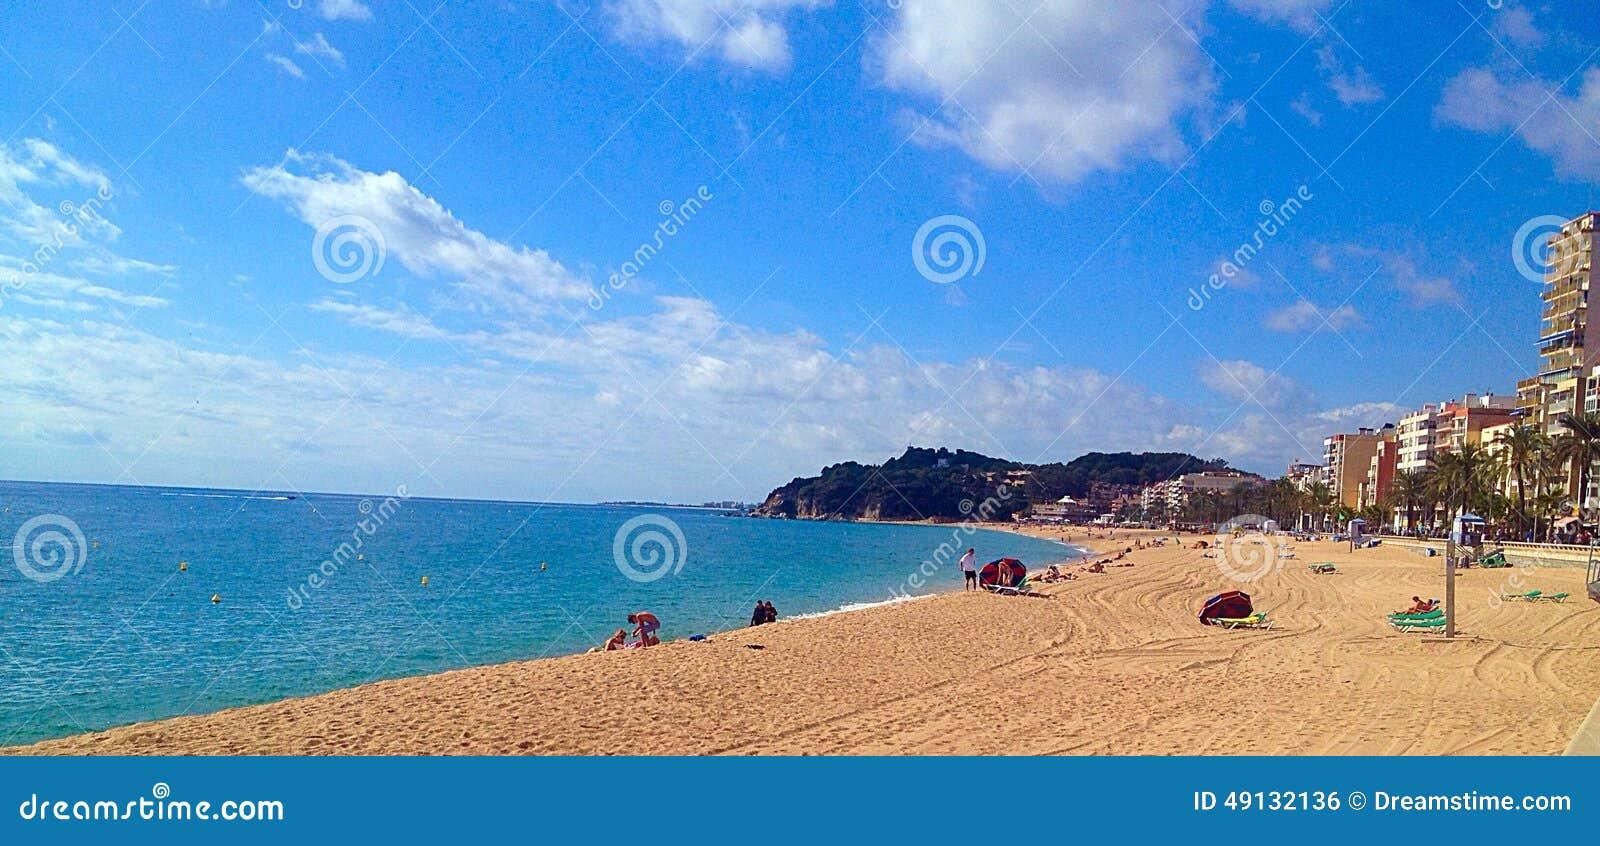 Mediterranean View From Spanish Coast Stock Photo - Image ...